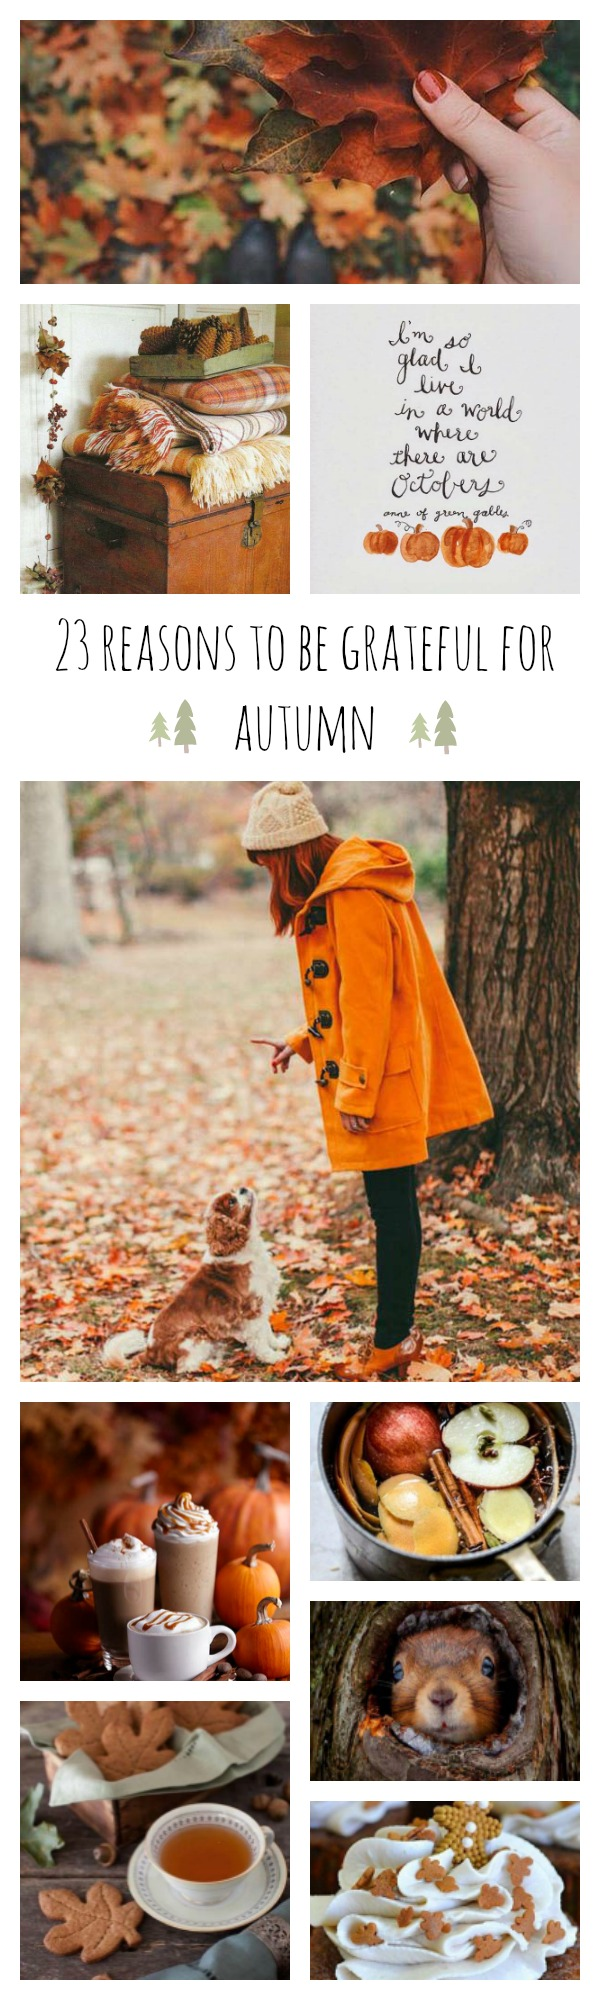 23 reasons to love autumn